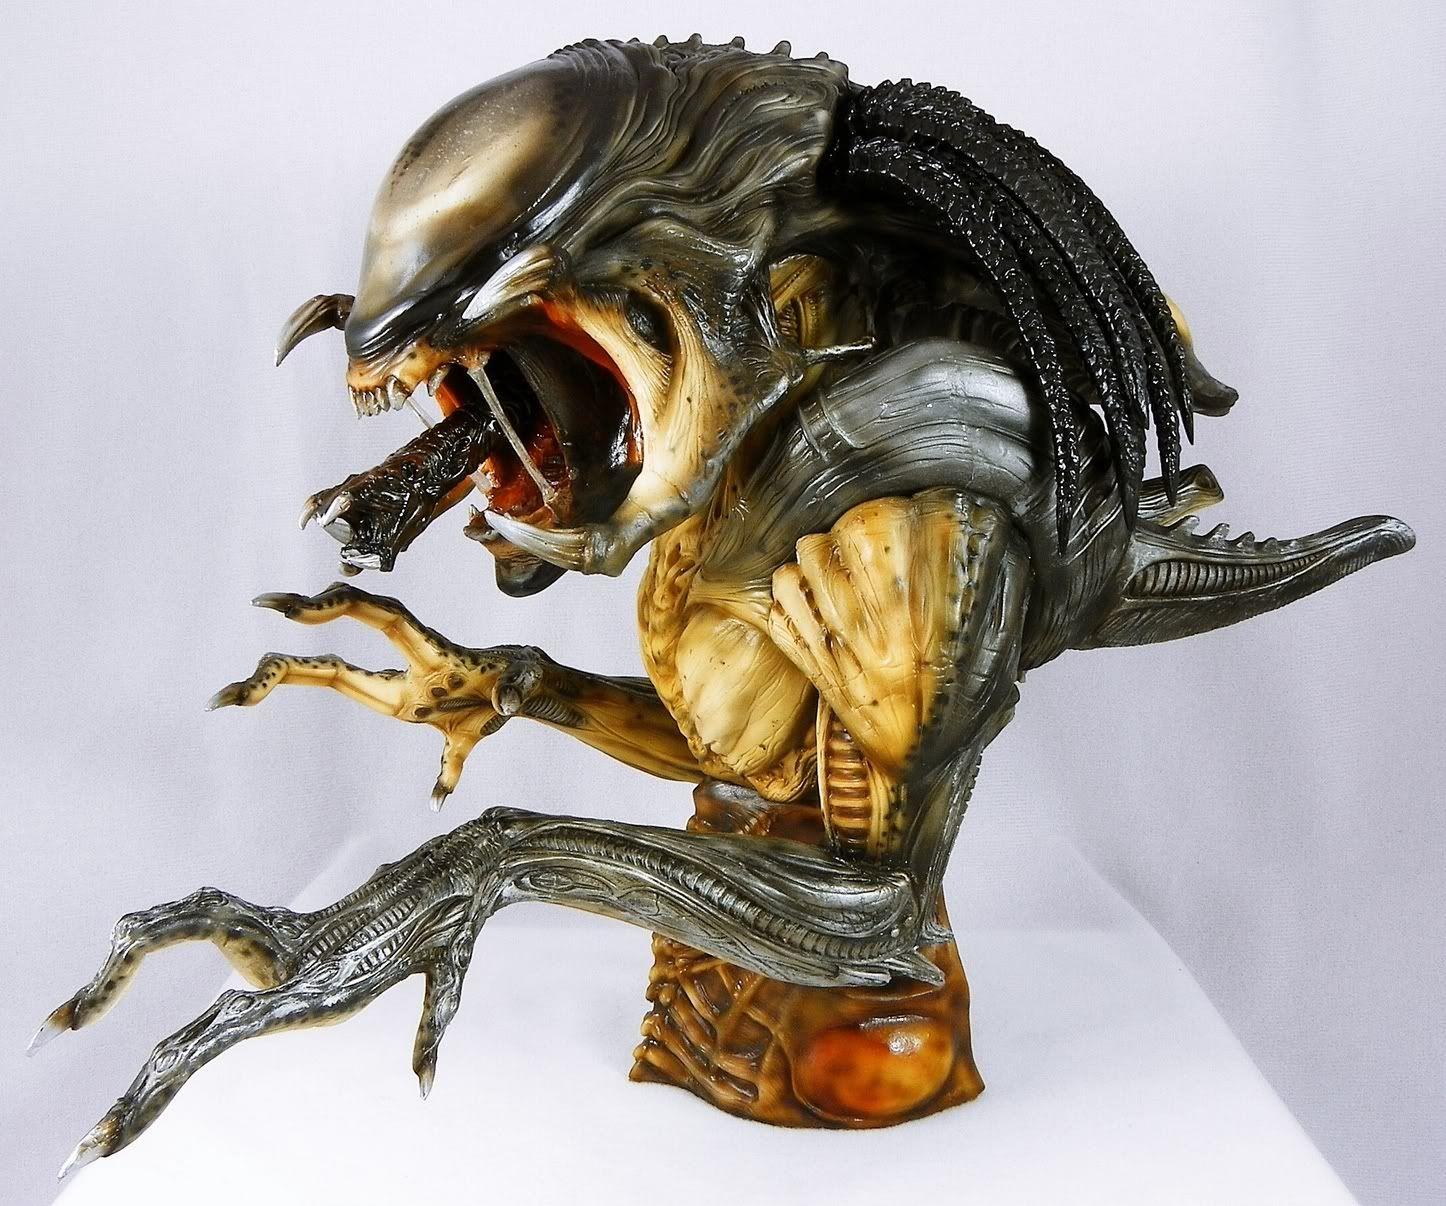 Predalien | Predator alien, Alien vs predator, Alien vs